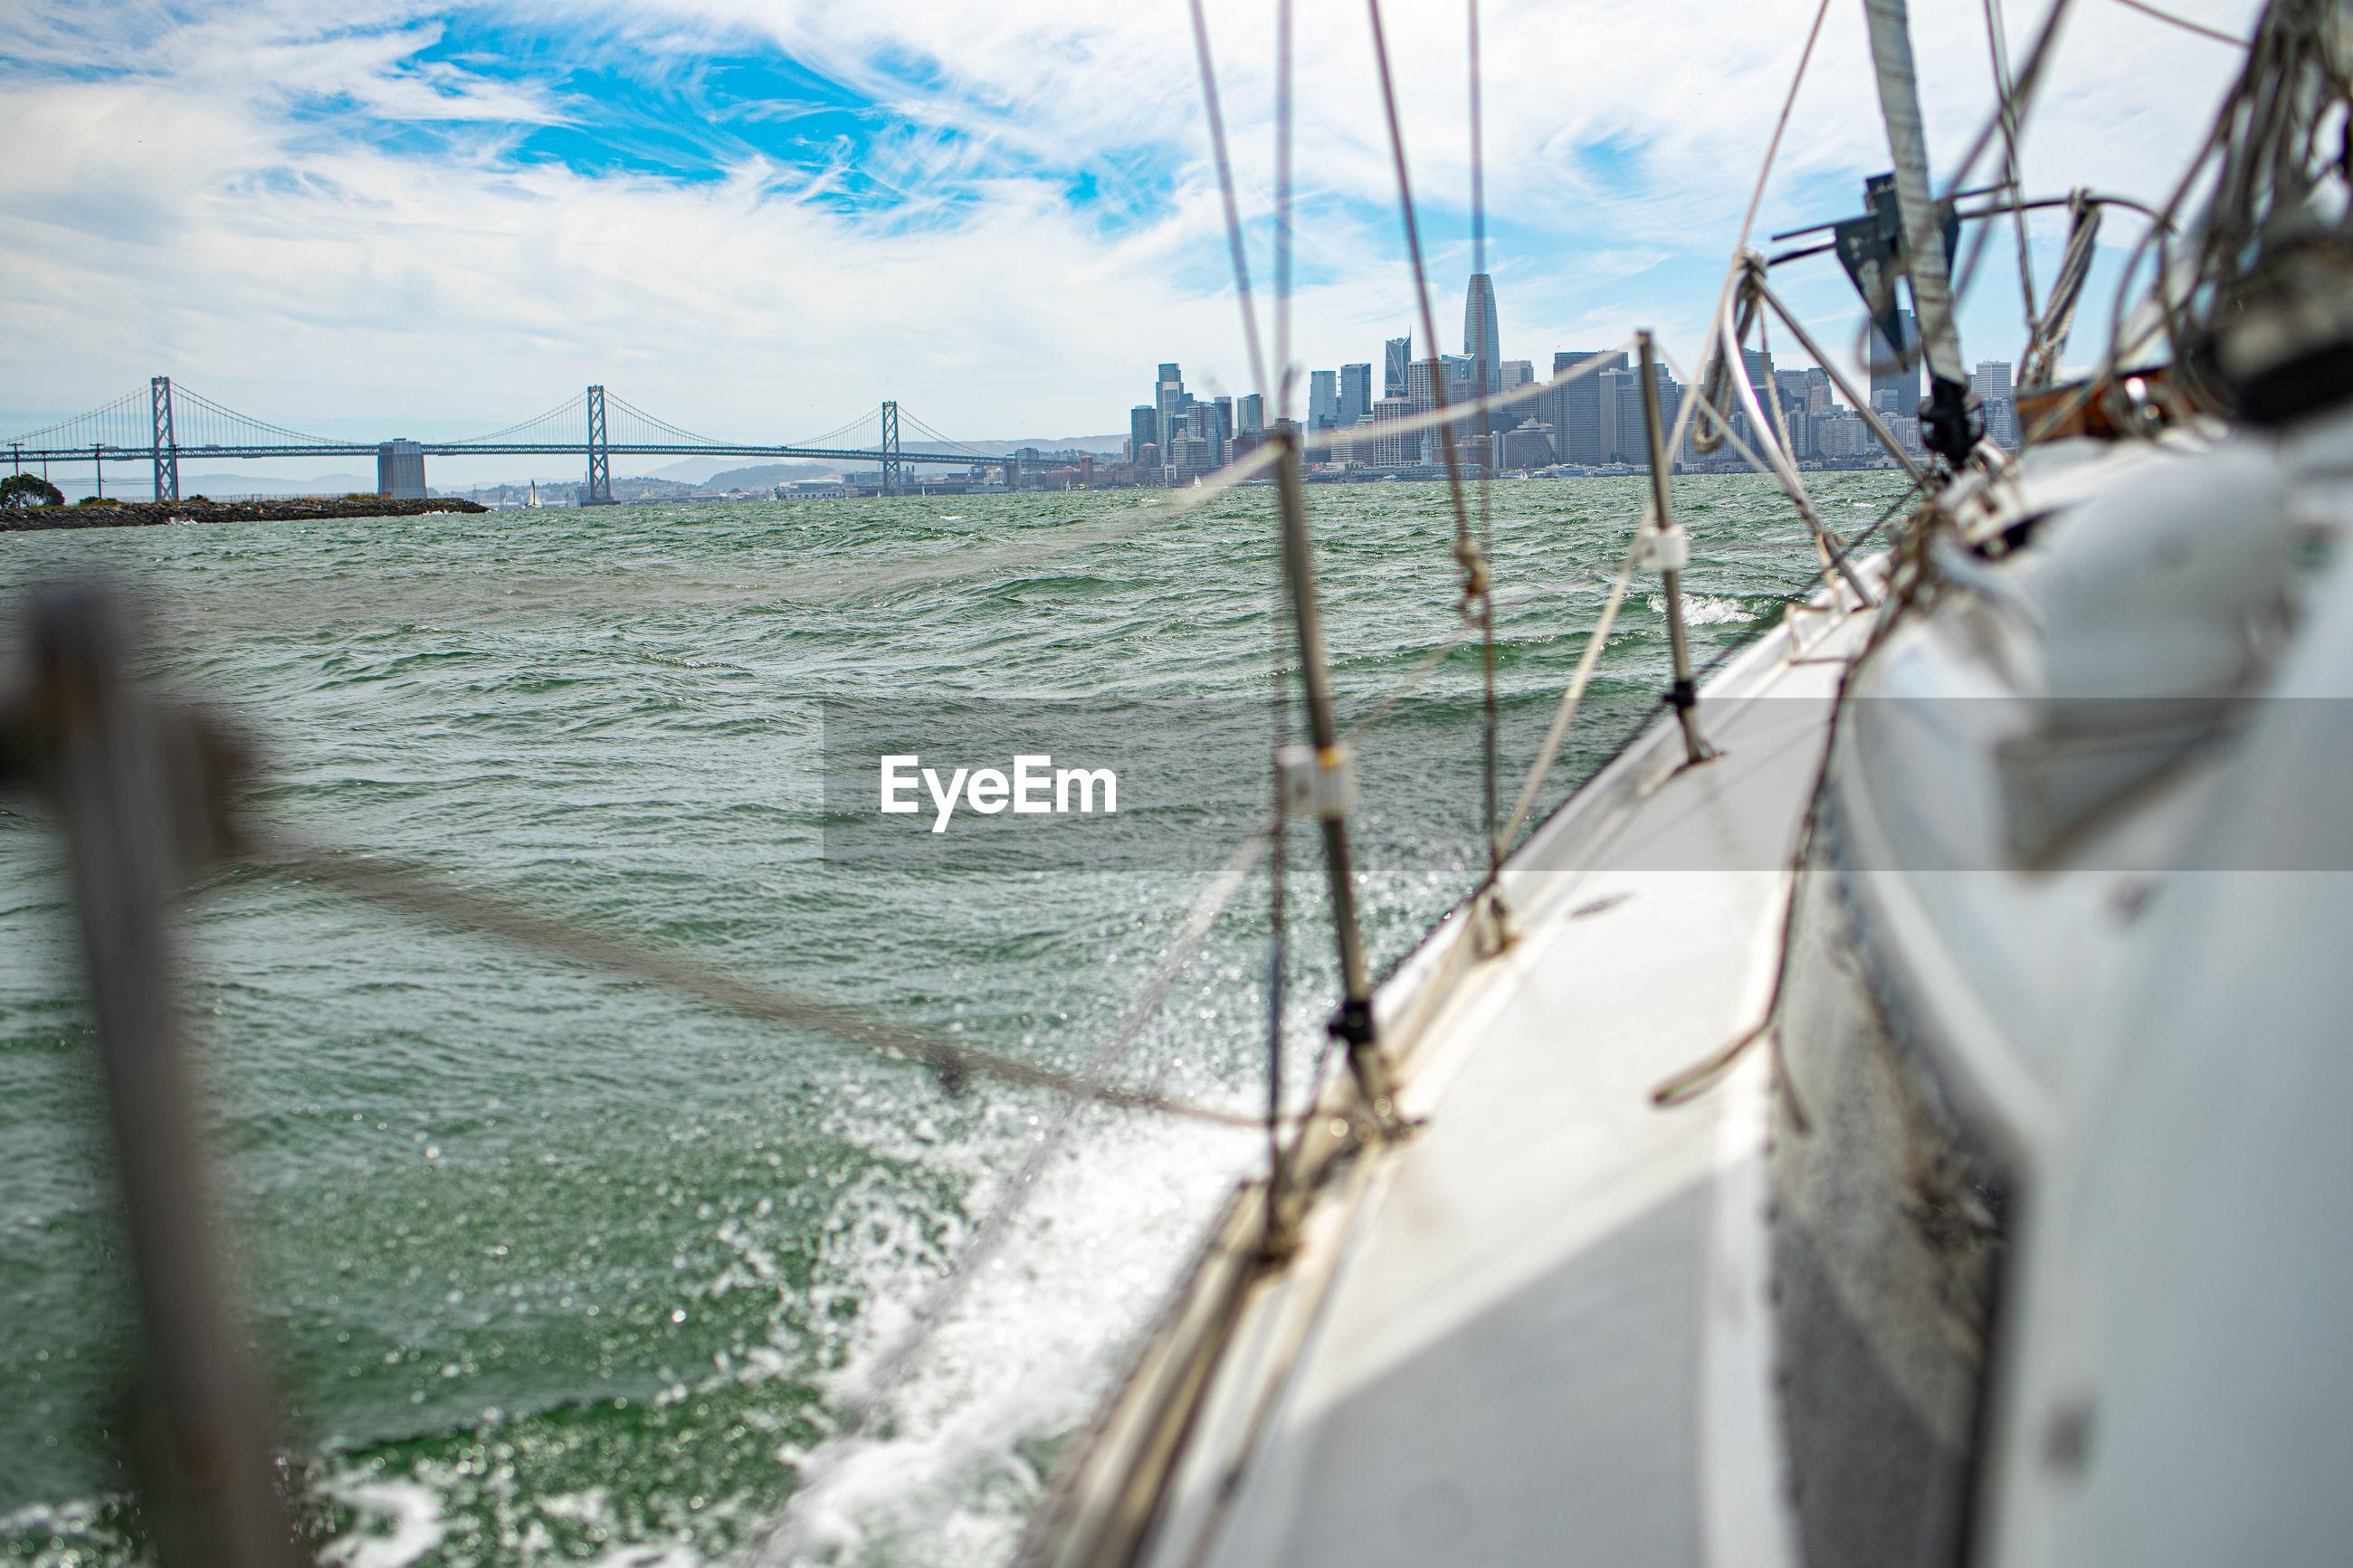 Sailboat sailing in sea against cityscape